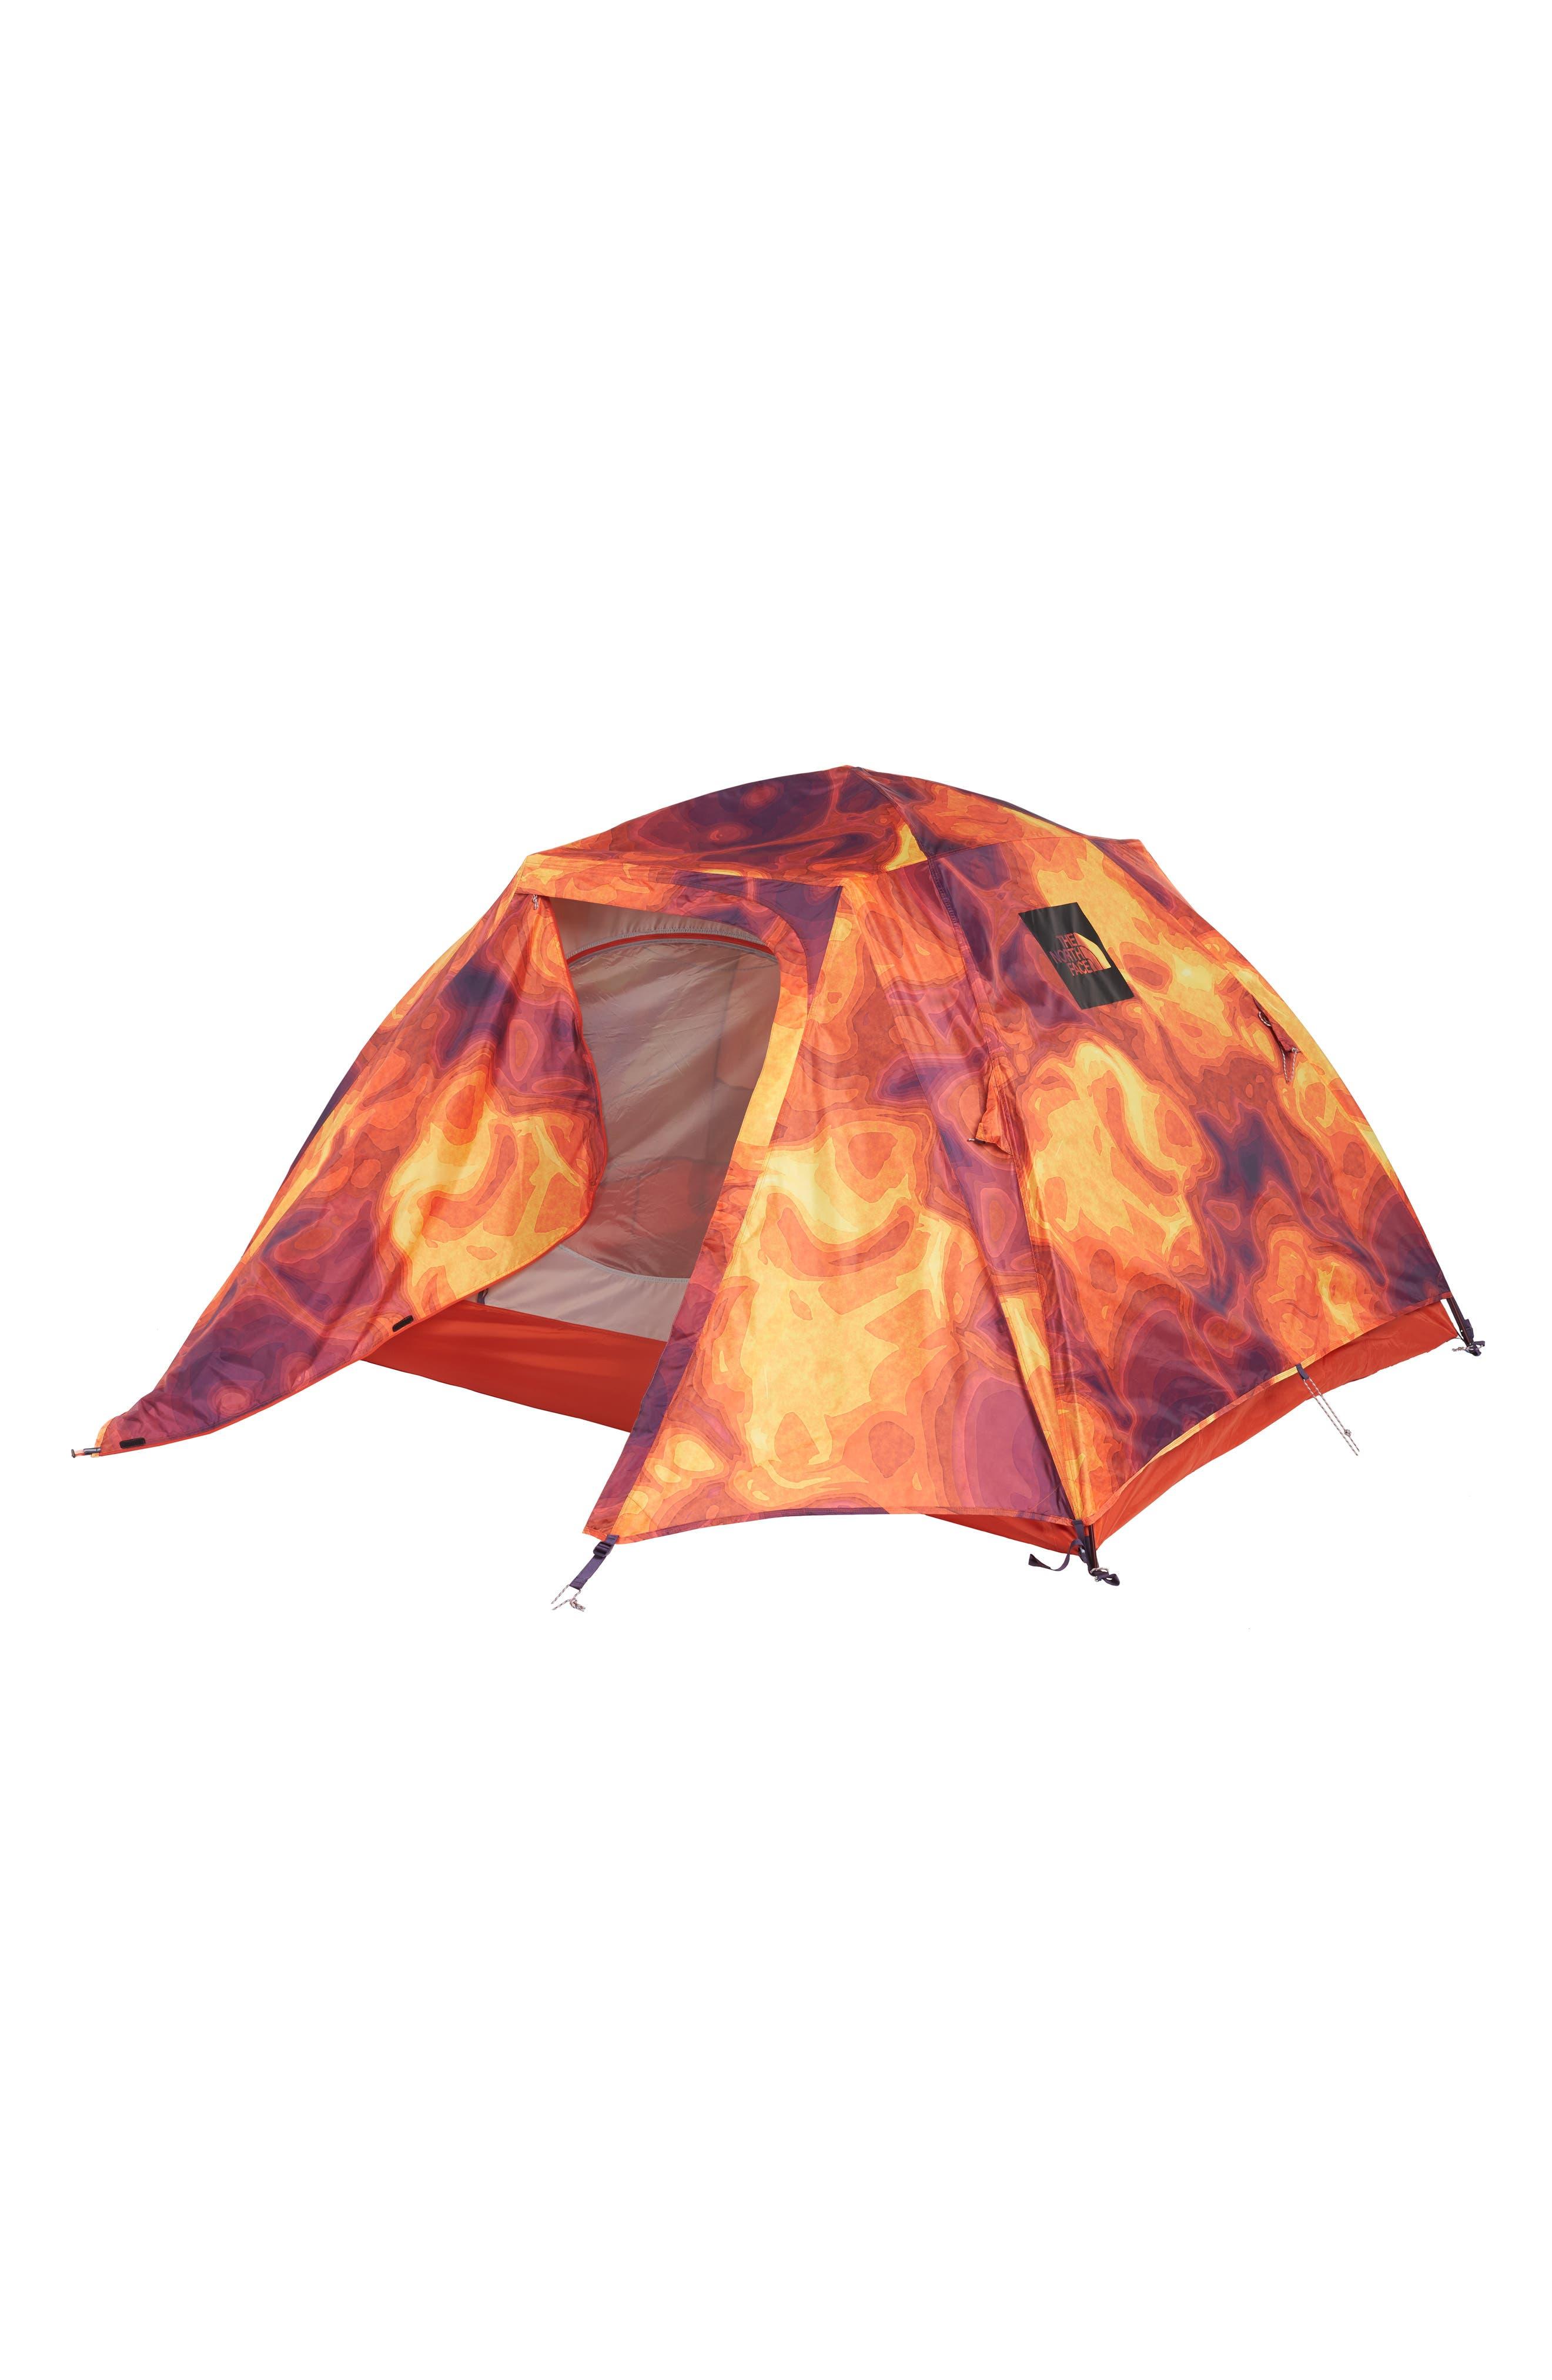 Homestead Roomy 2 Tent,                         Main,                         color, Tibetan Orange/ High Rise Grey